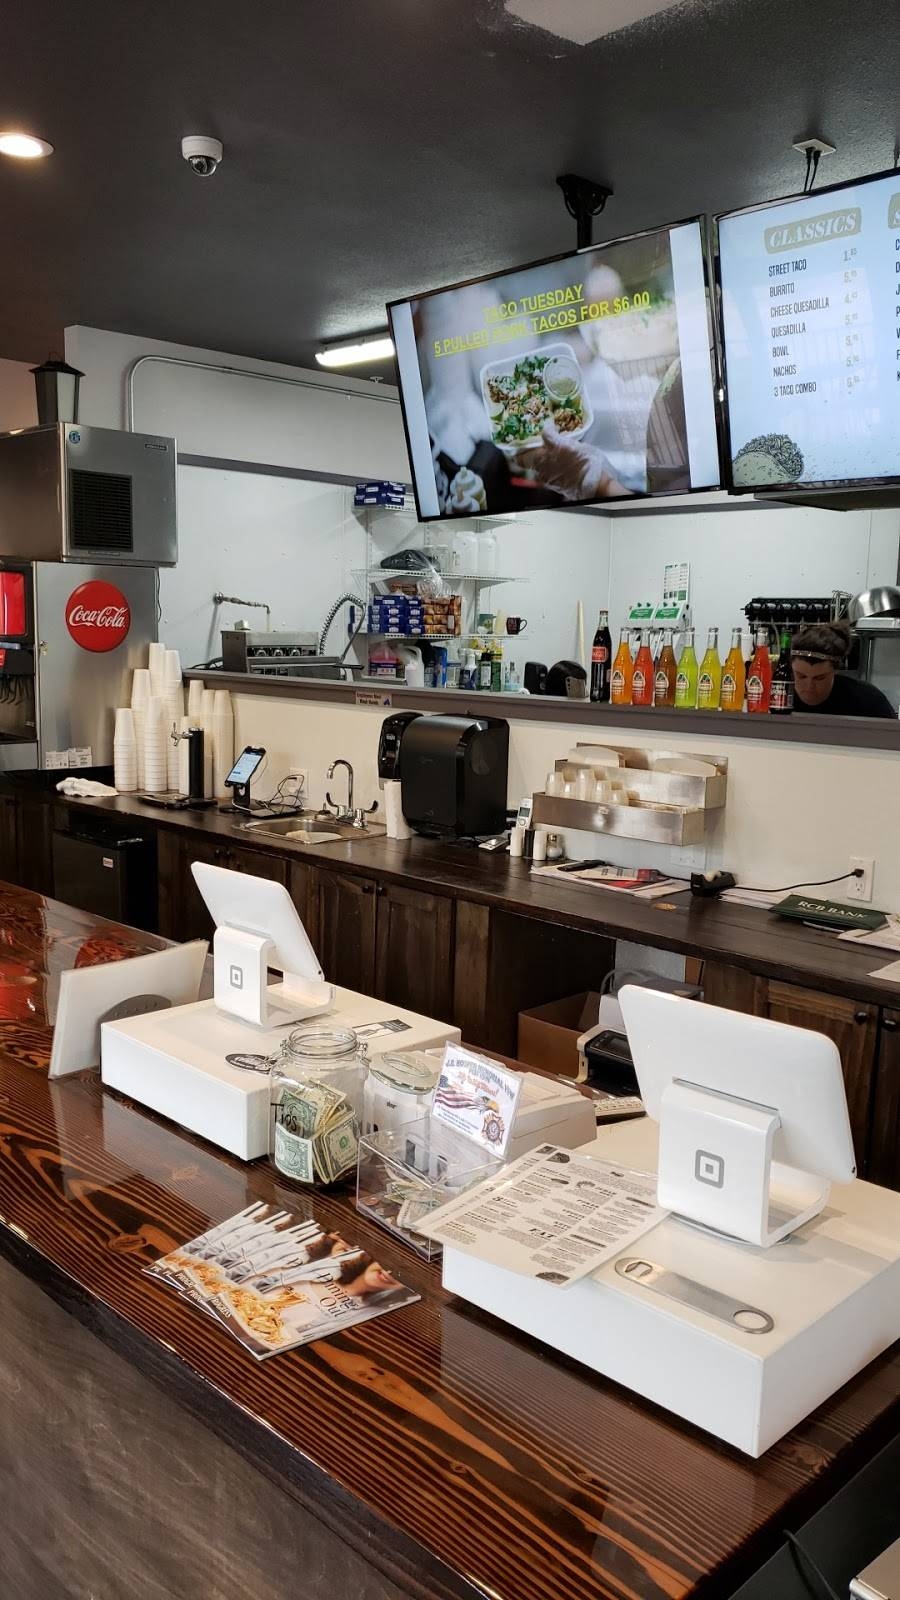 Remys Chop Shop   restaurant   609 S Brady St STE 125, Claremore, OK 74017, USA   9189232164 OR +1 918-923-2164